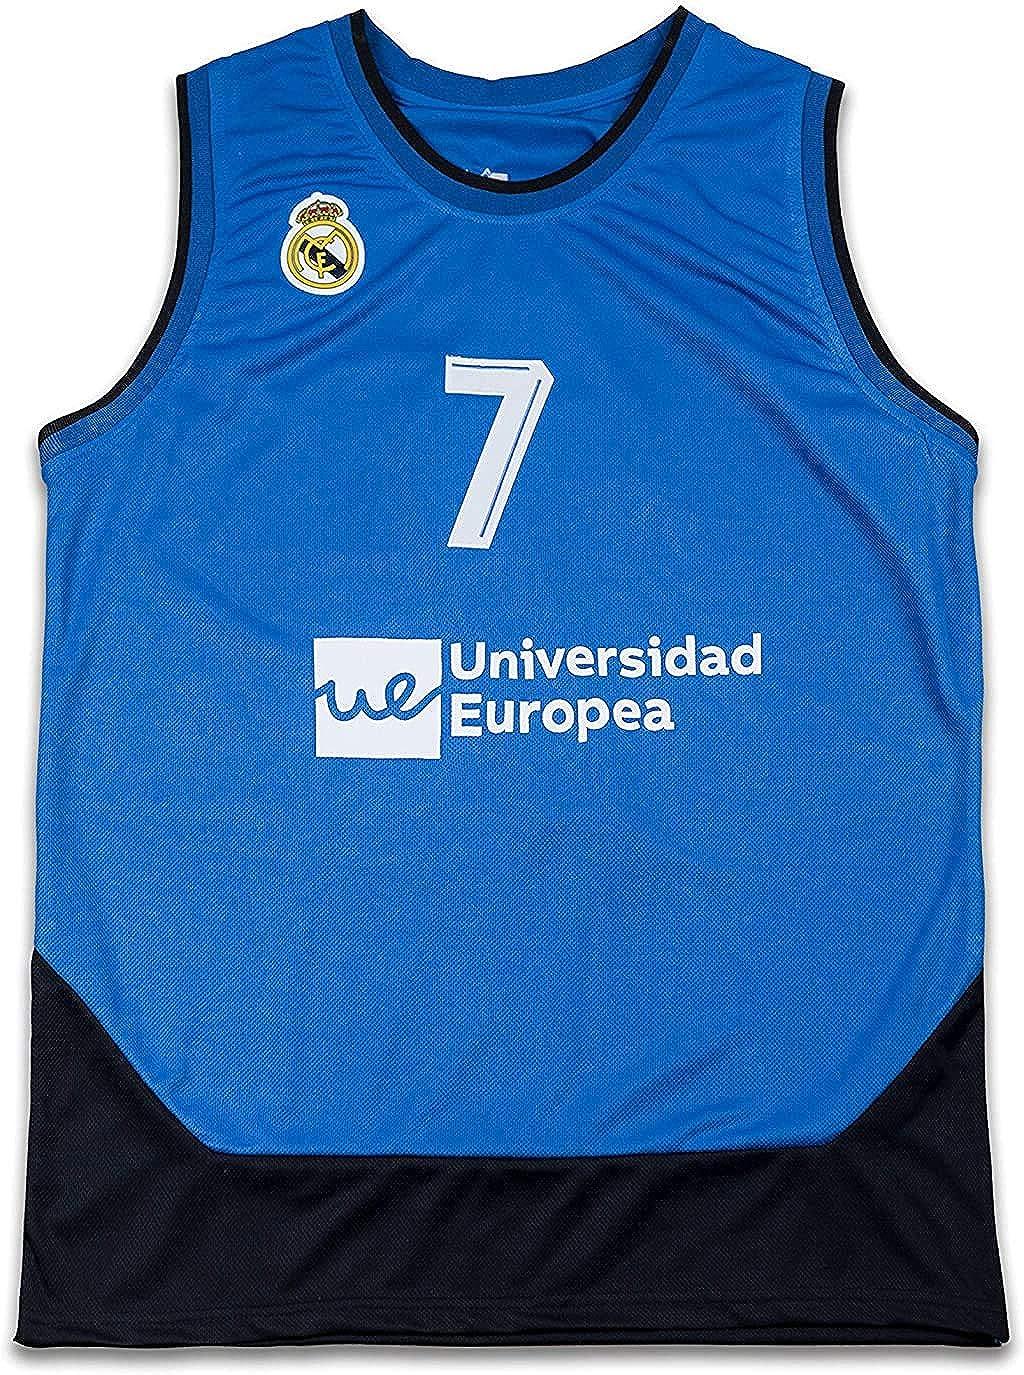 Luka Doncic Stitch Euro Max 77% OFF Basketball Half Patch Finally popular brand XS-6 Jersey League